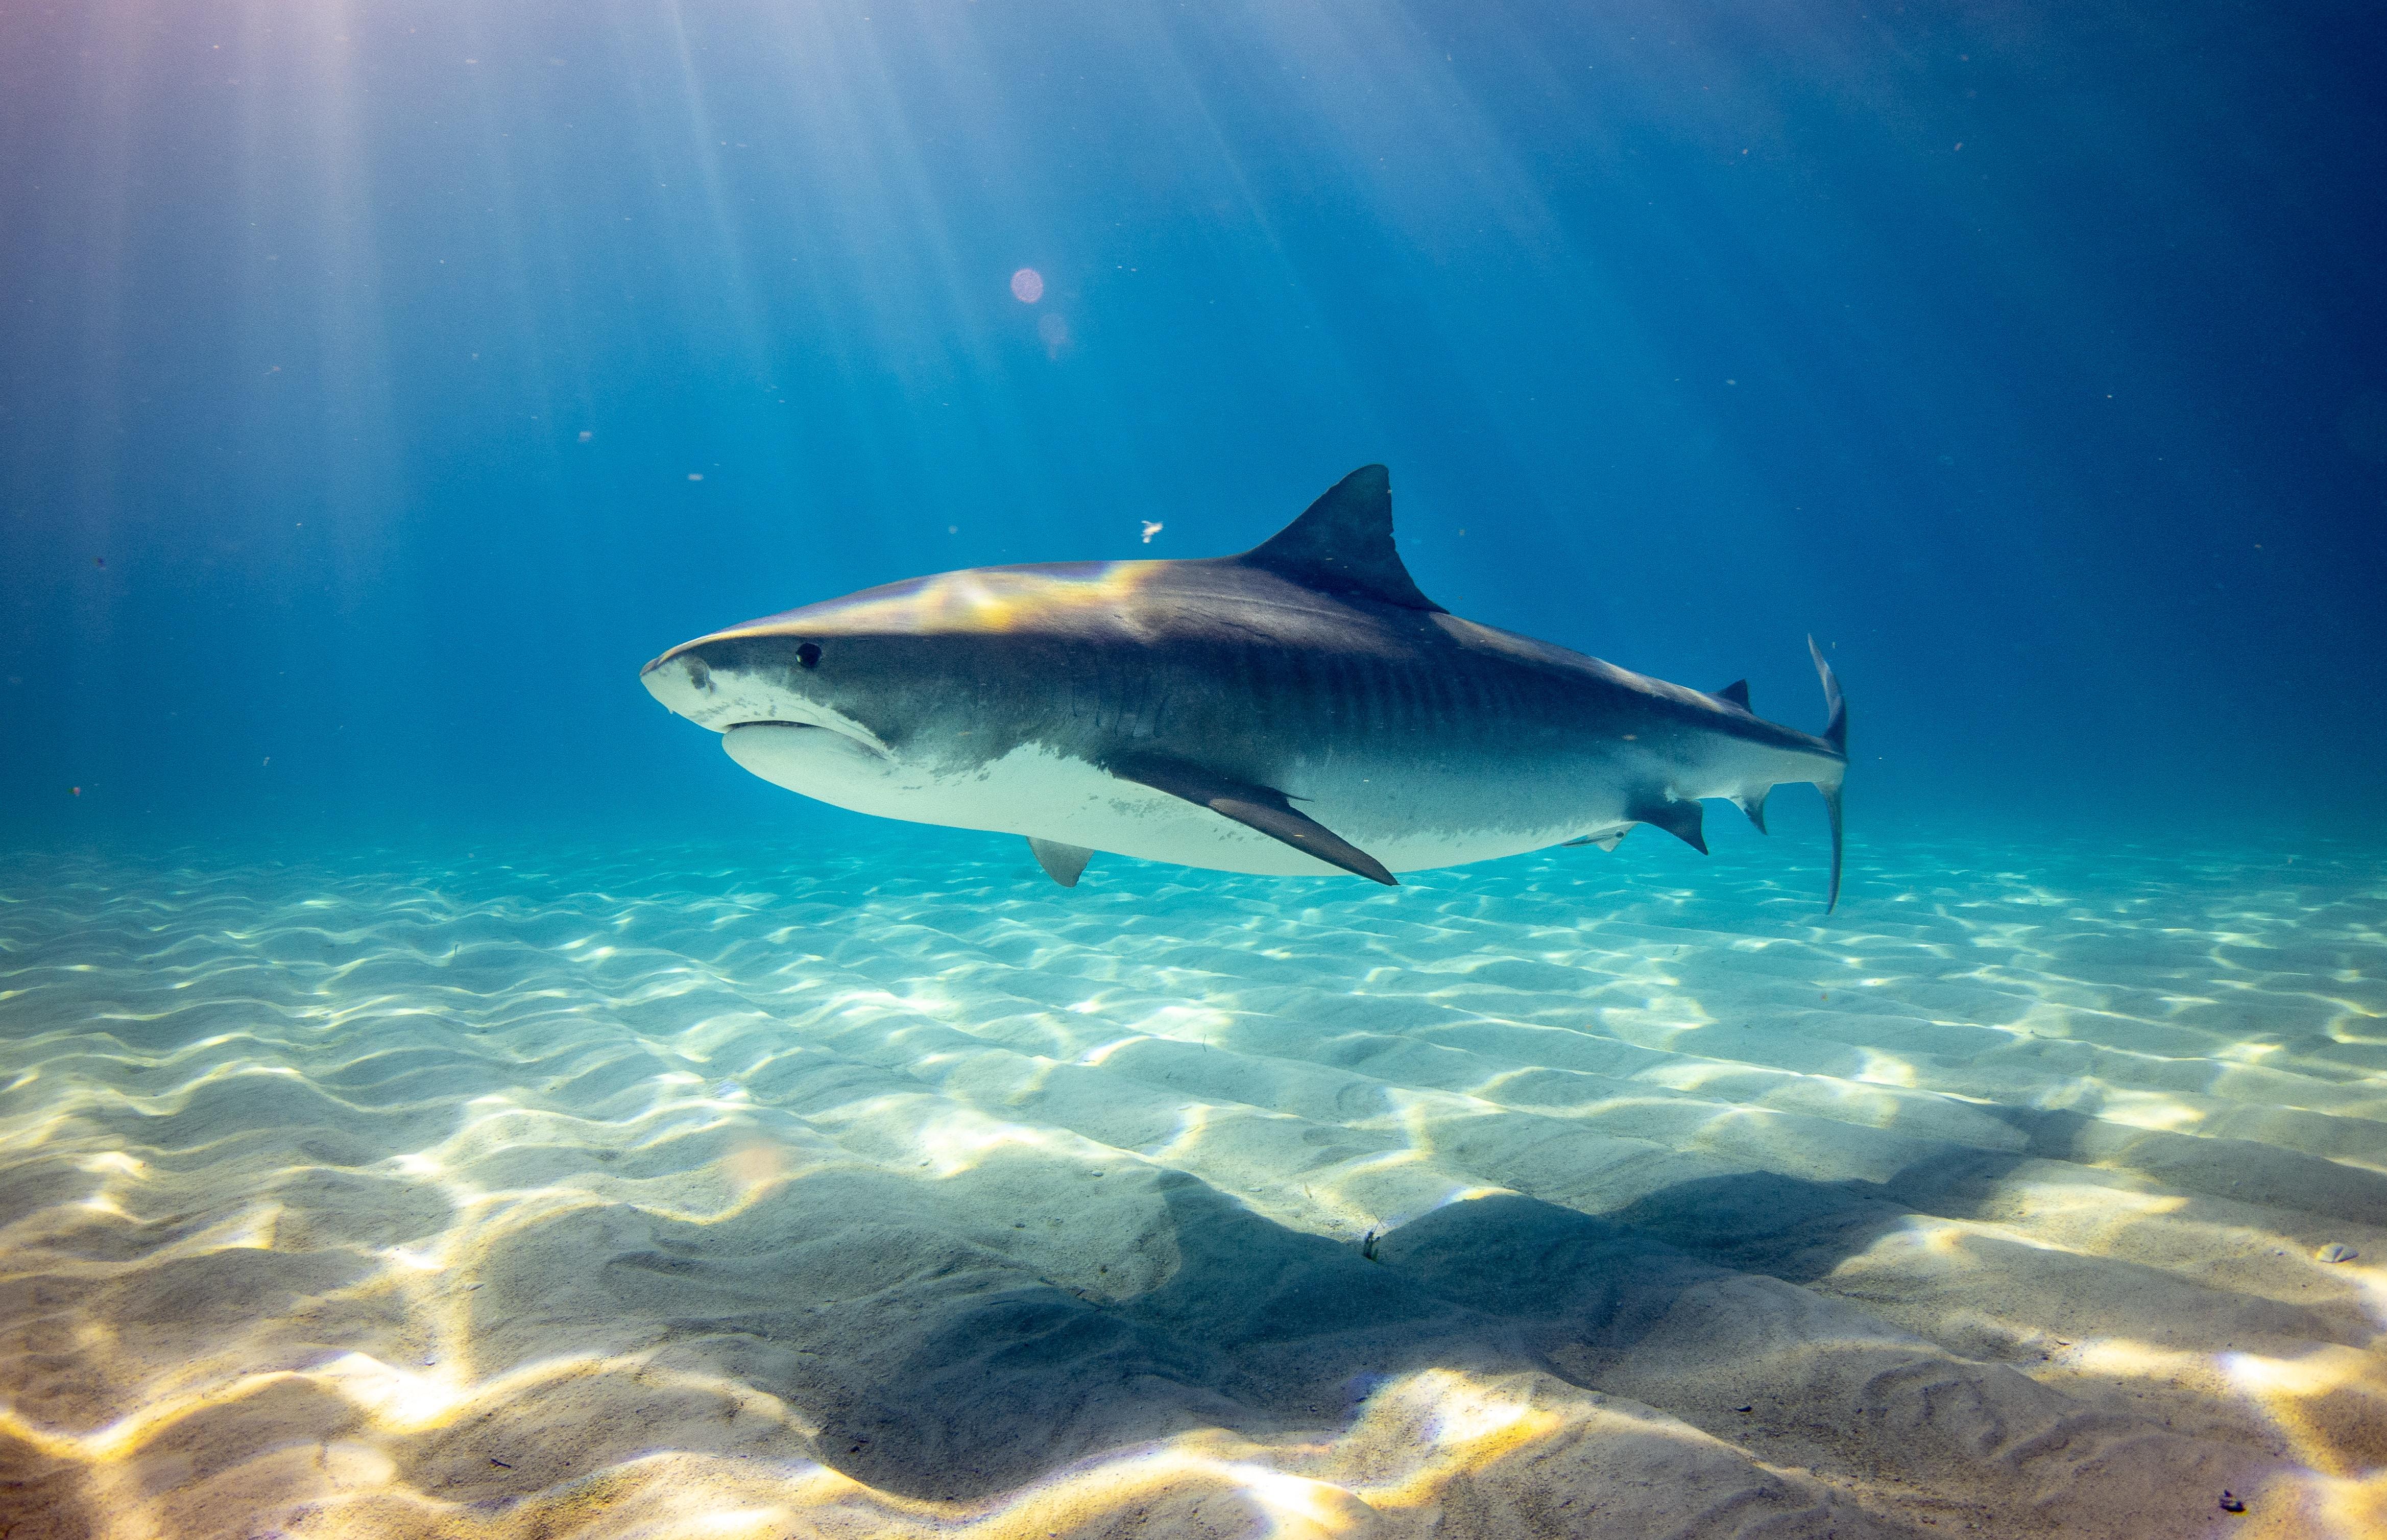 Sharks in Lake Michigan?